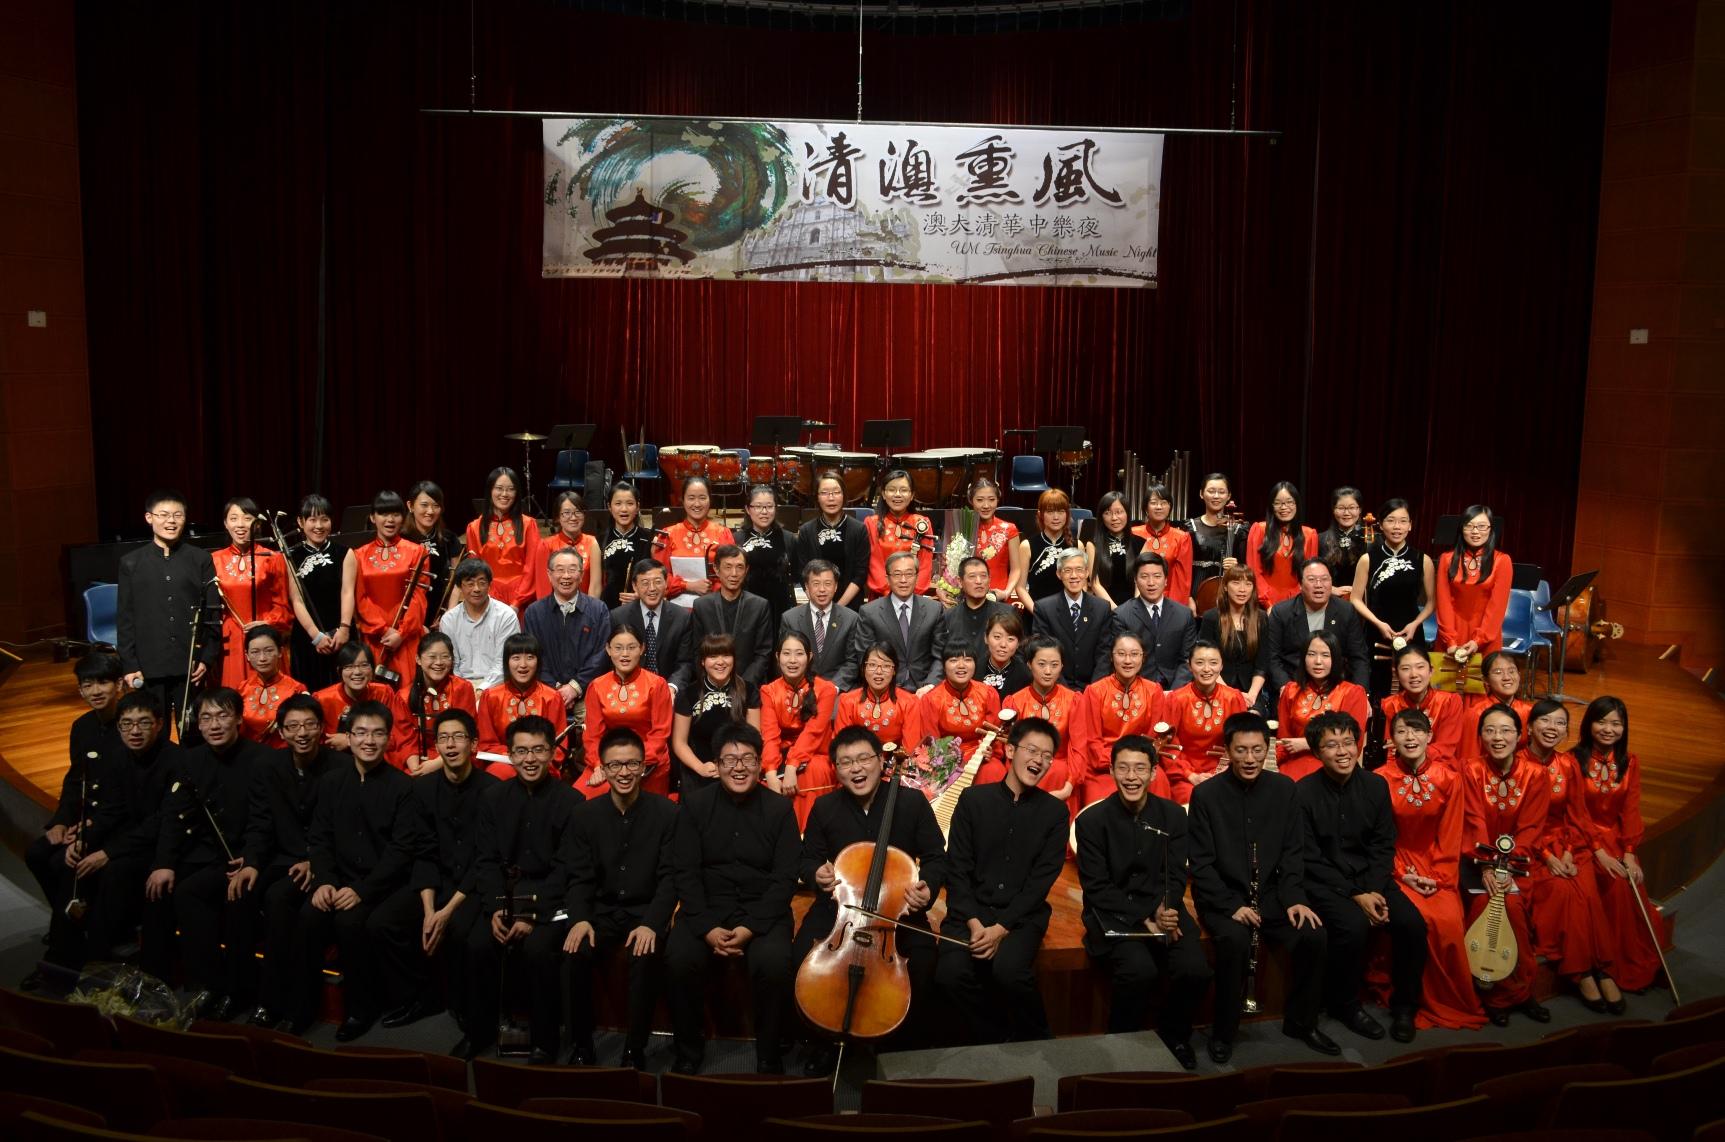 Members of the Chinese music groups of UM and Tsinghua University